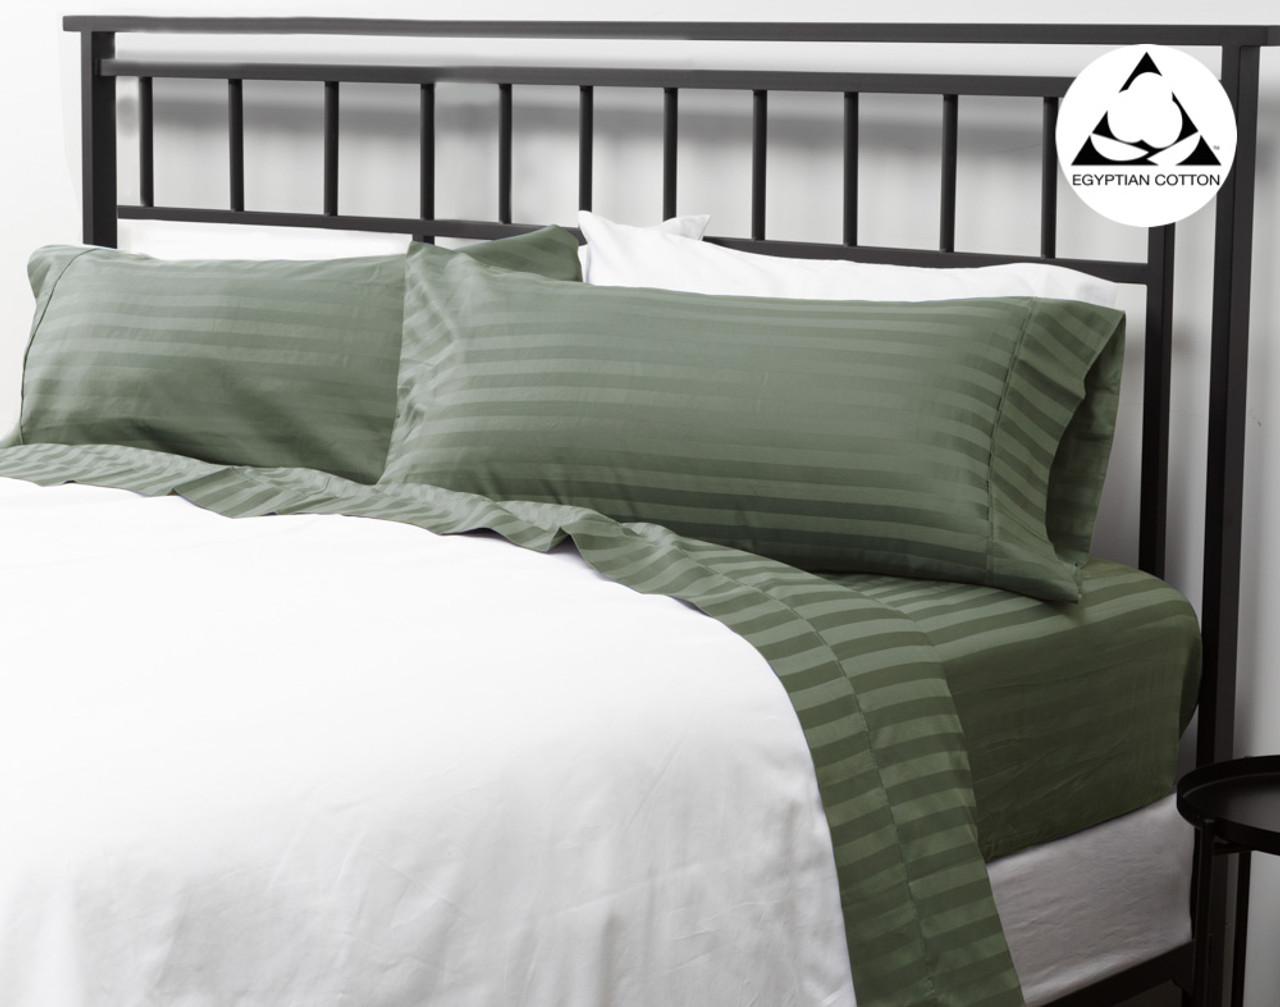 Striped Egyptian Cotton 600tc California King Sheet Set Cactus